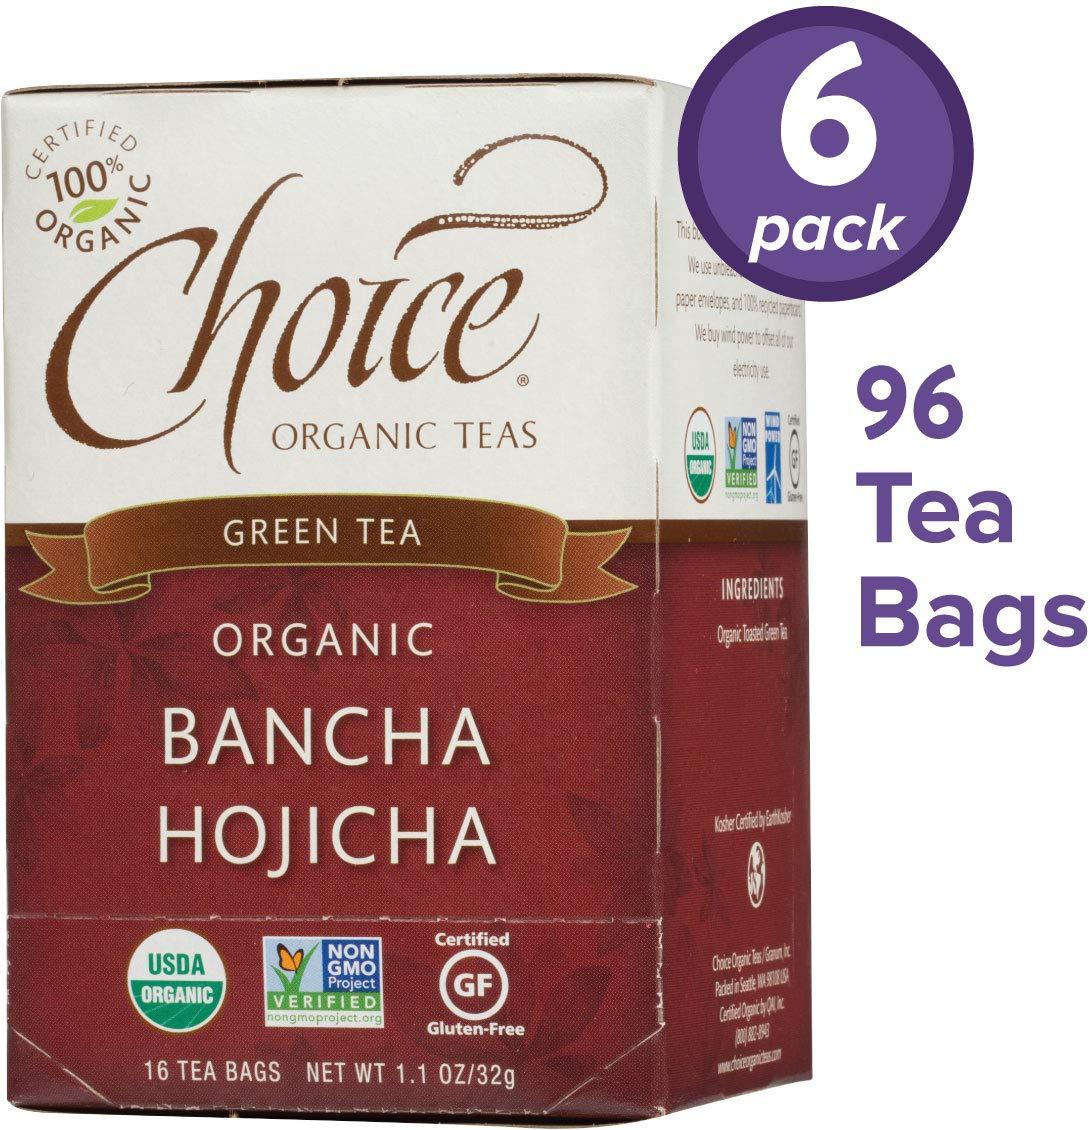 Choice Organic Teas Green Tea, 6 Boxes of 16 (96 Tea Bags), Bancha Hojicha